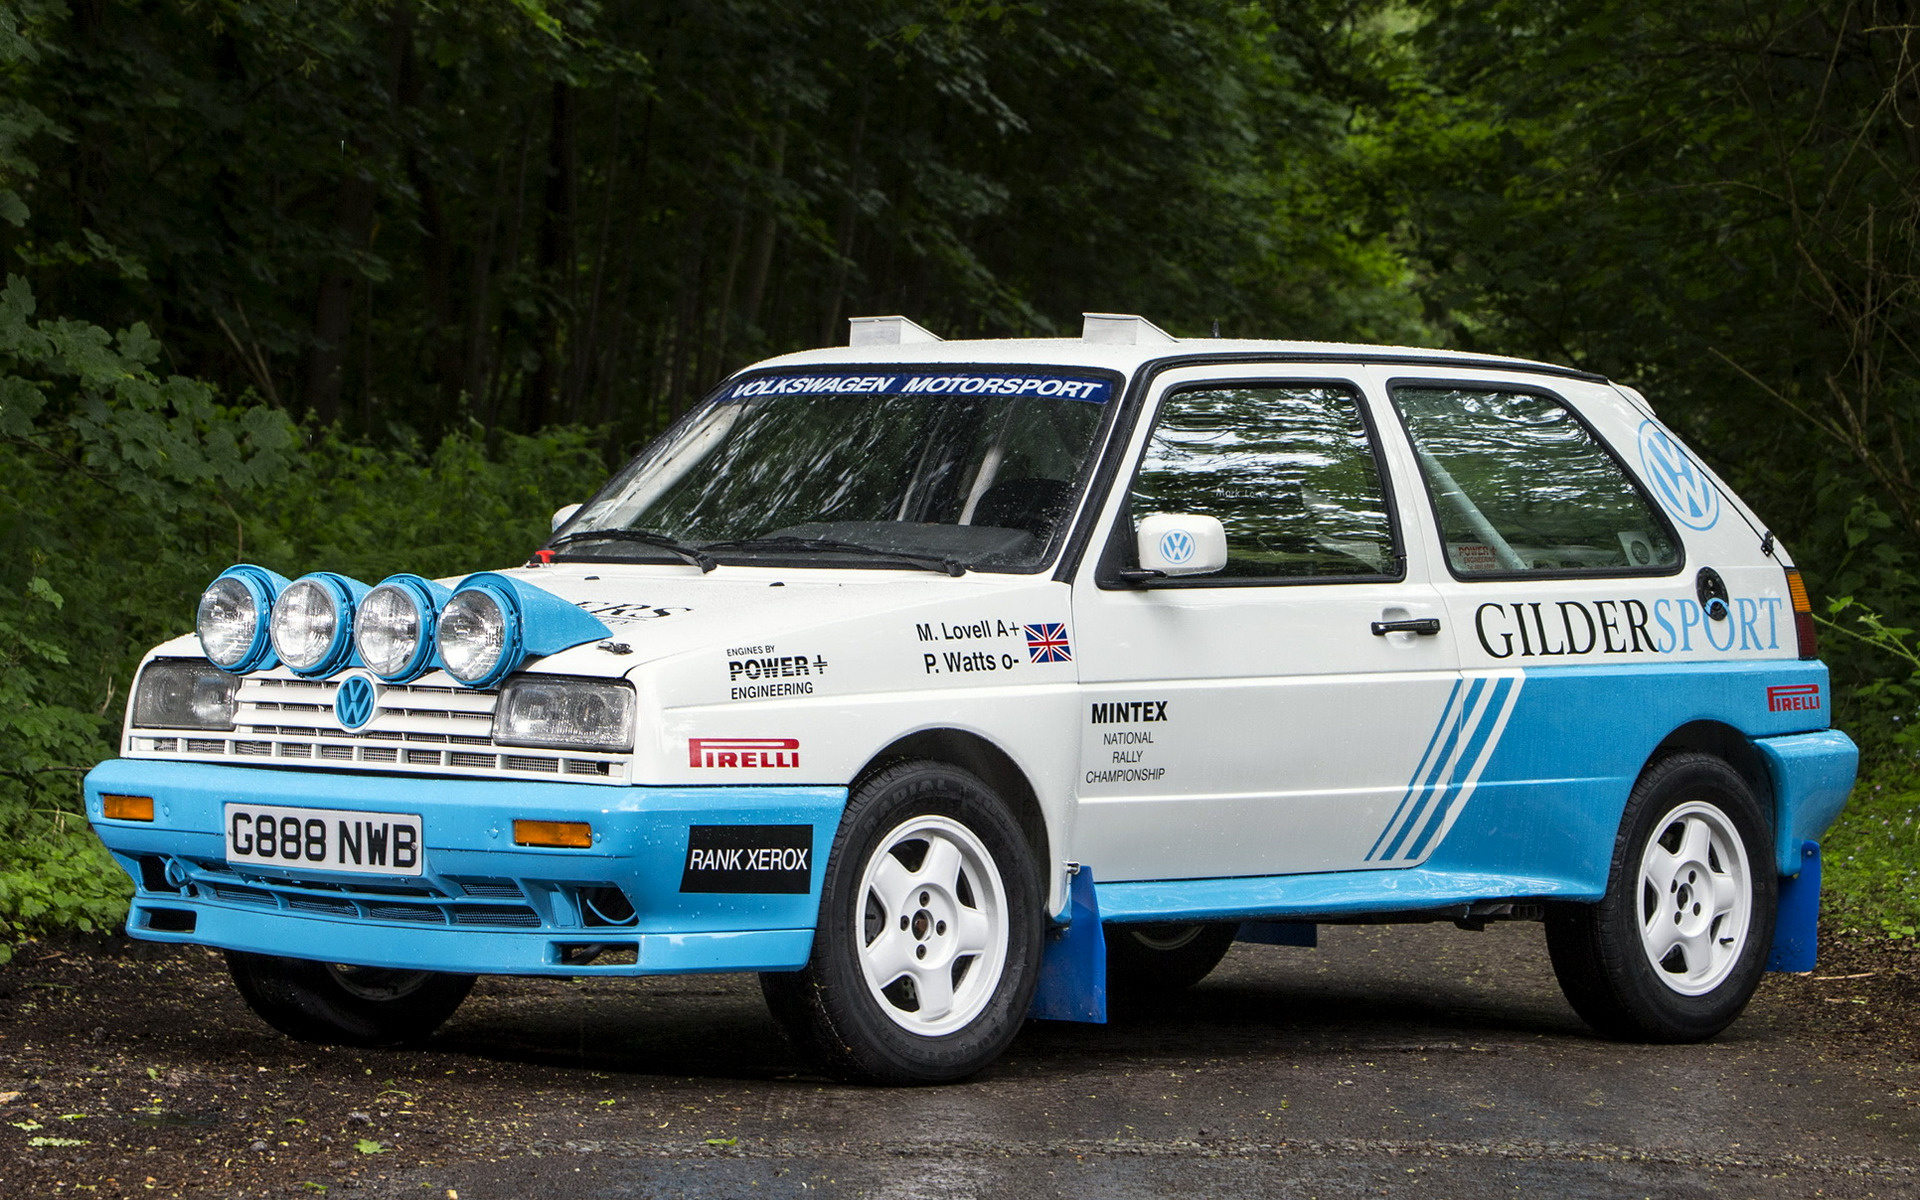 Volkswagen E Golf >> 1990 Volkswagen Rallye Golf Rally Car - Wallpapers and HD ...